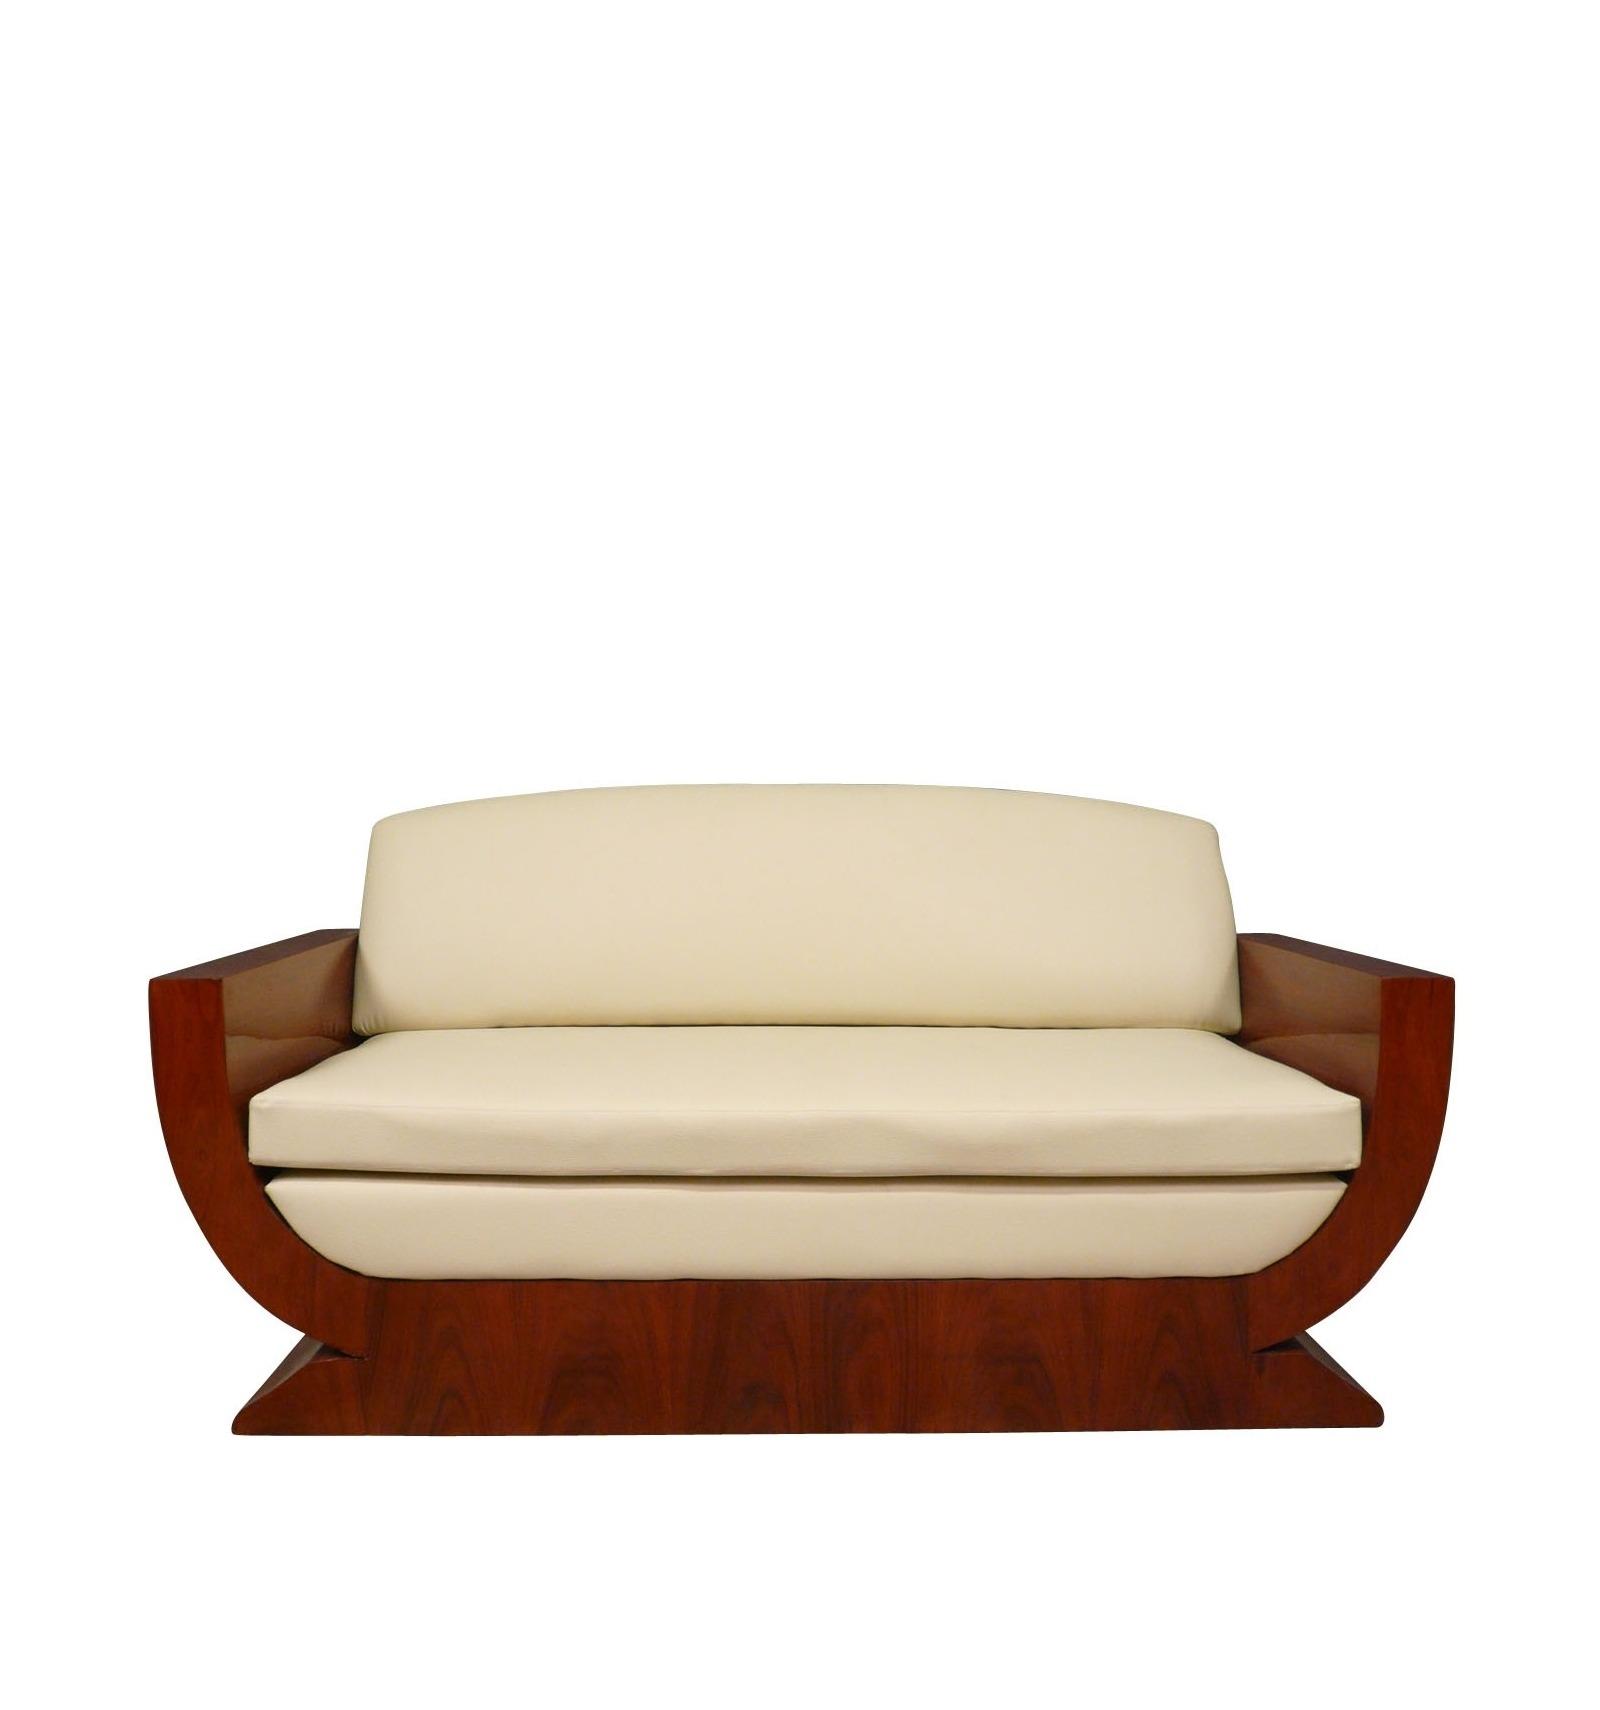 Art Deco Sofa aus Palisander - Art Deco Möbel